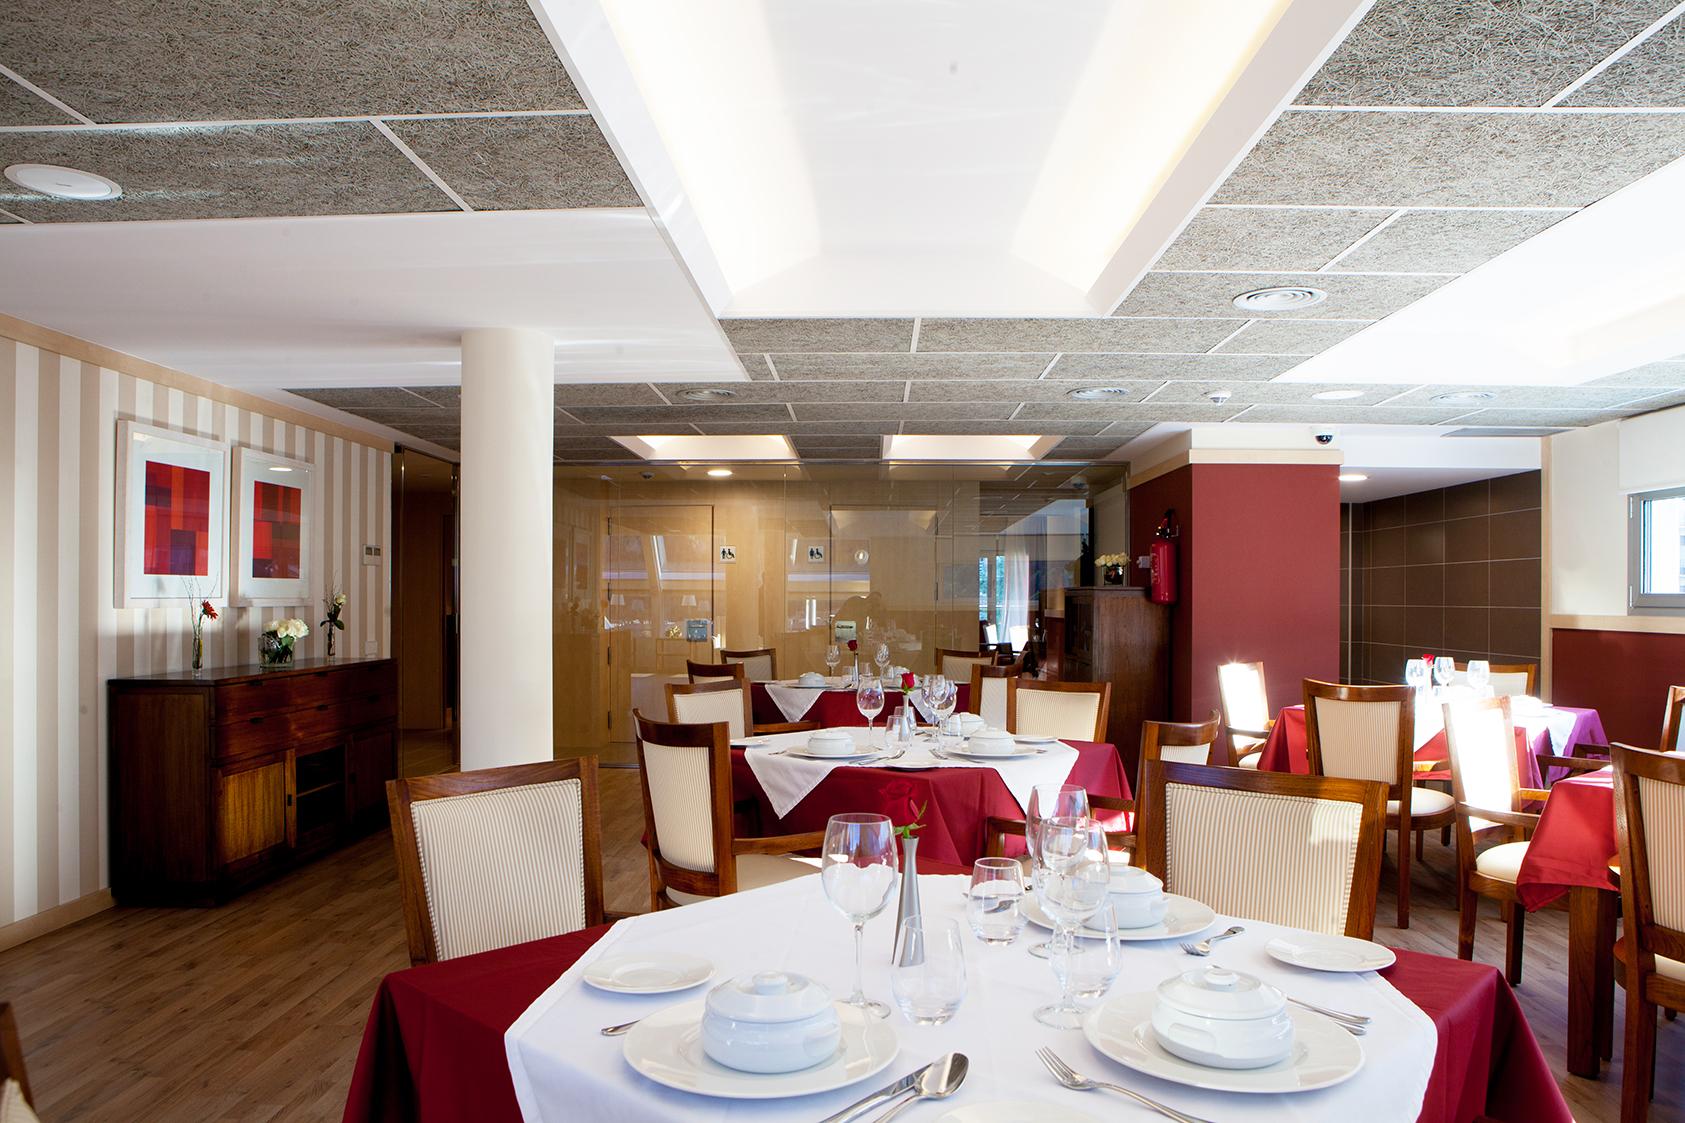 Comedor Residencia de ancianos en Andorra